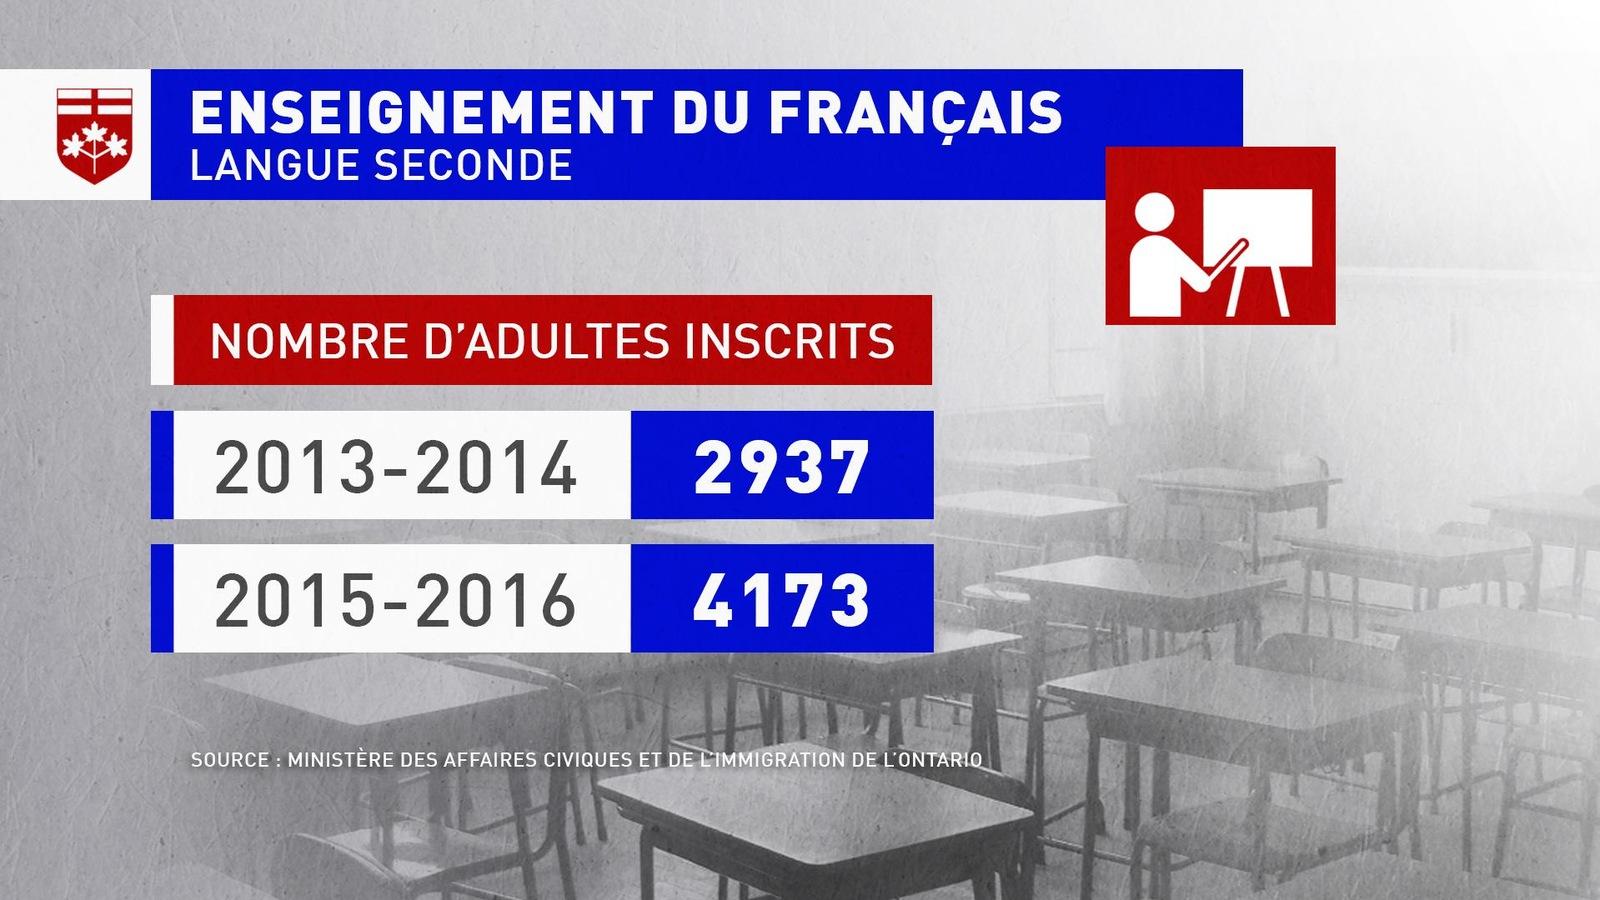 Un tableau. Nombre d'adultes inscrits: 2013-14: 2937; 2015-16: 4173